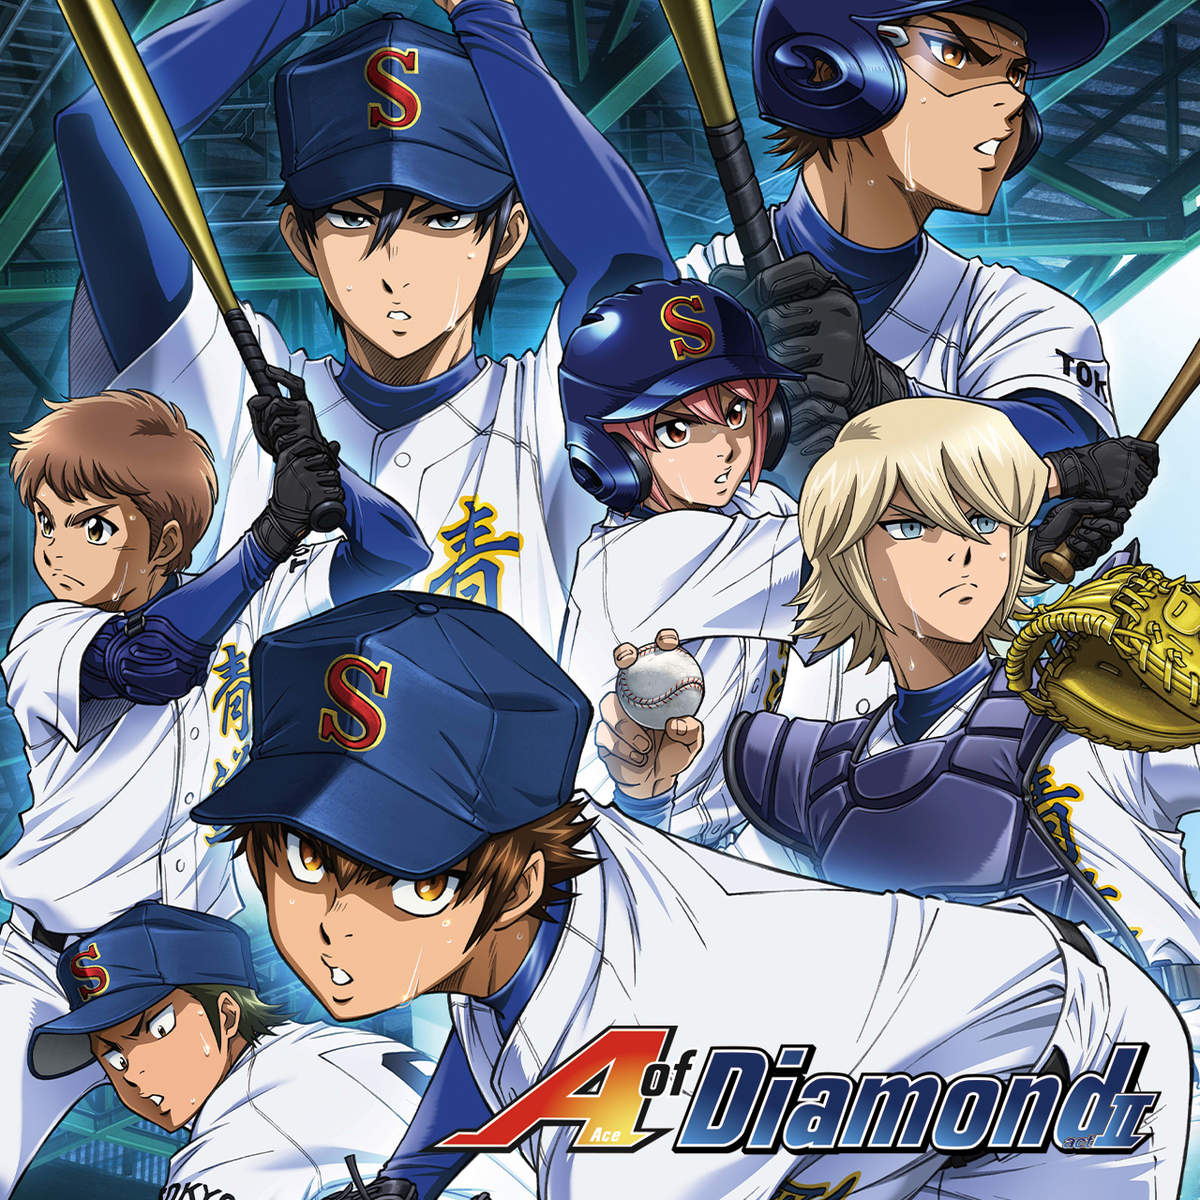 Ace of Diamond ACT2 | Daiya No Ace